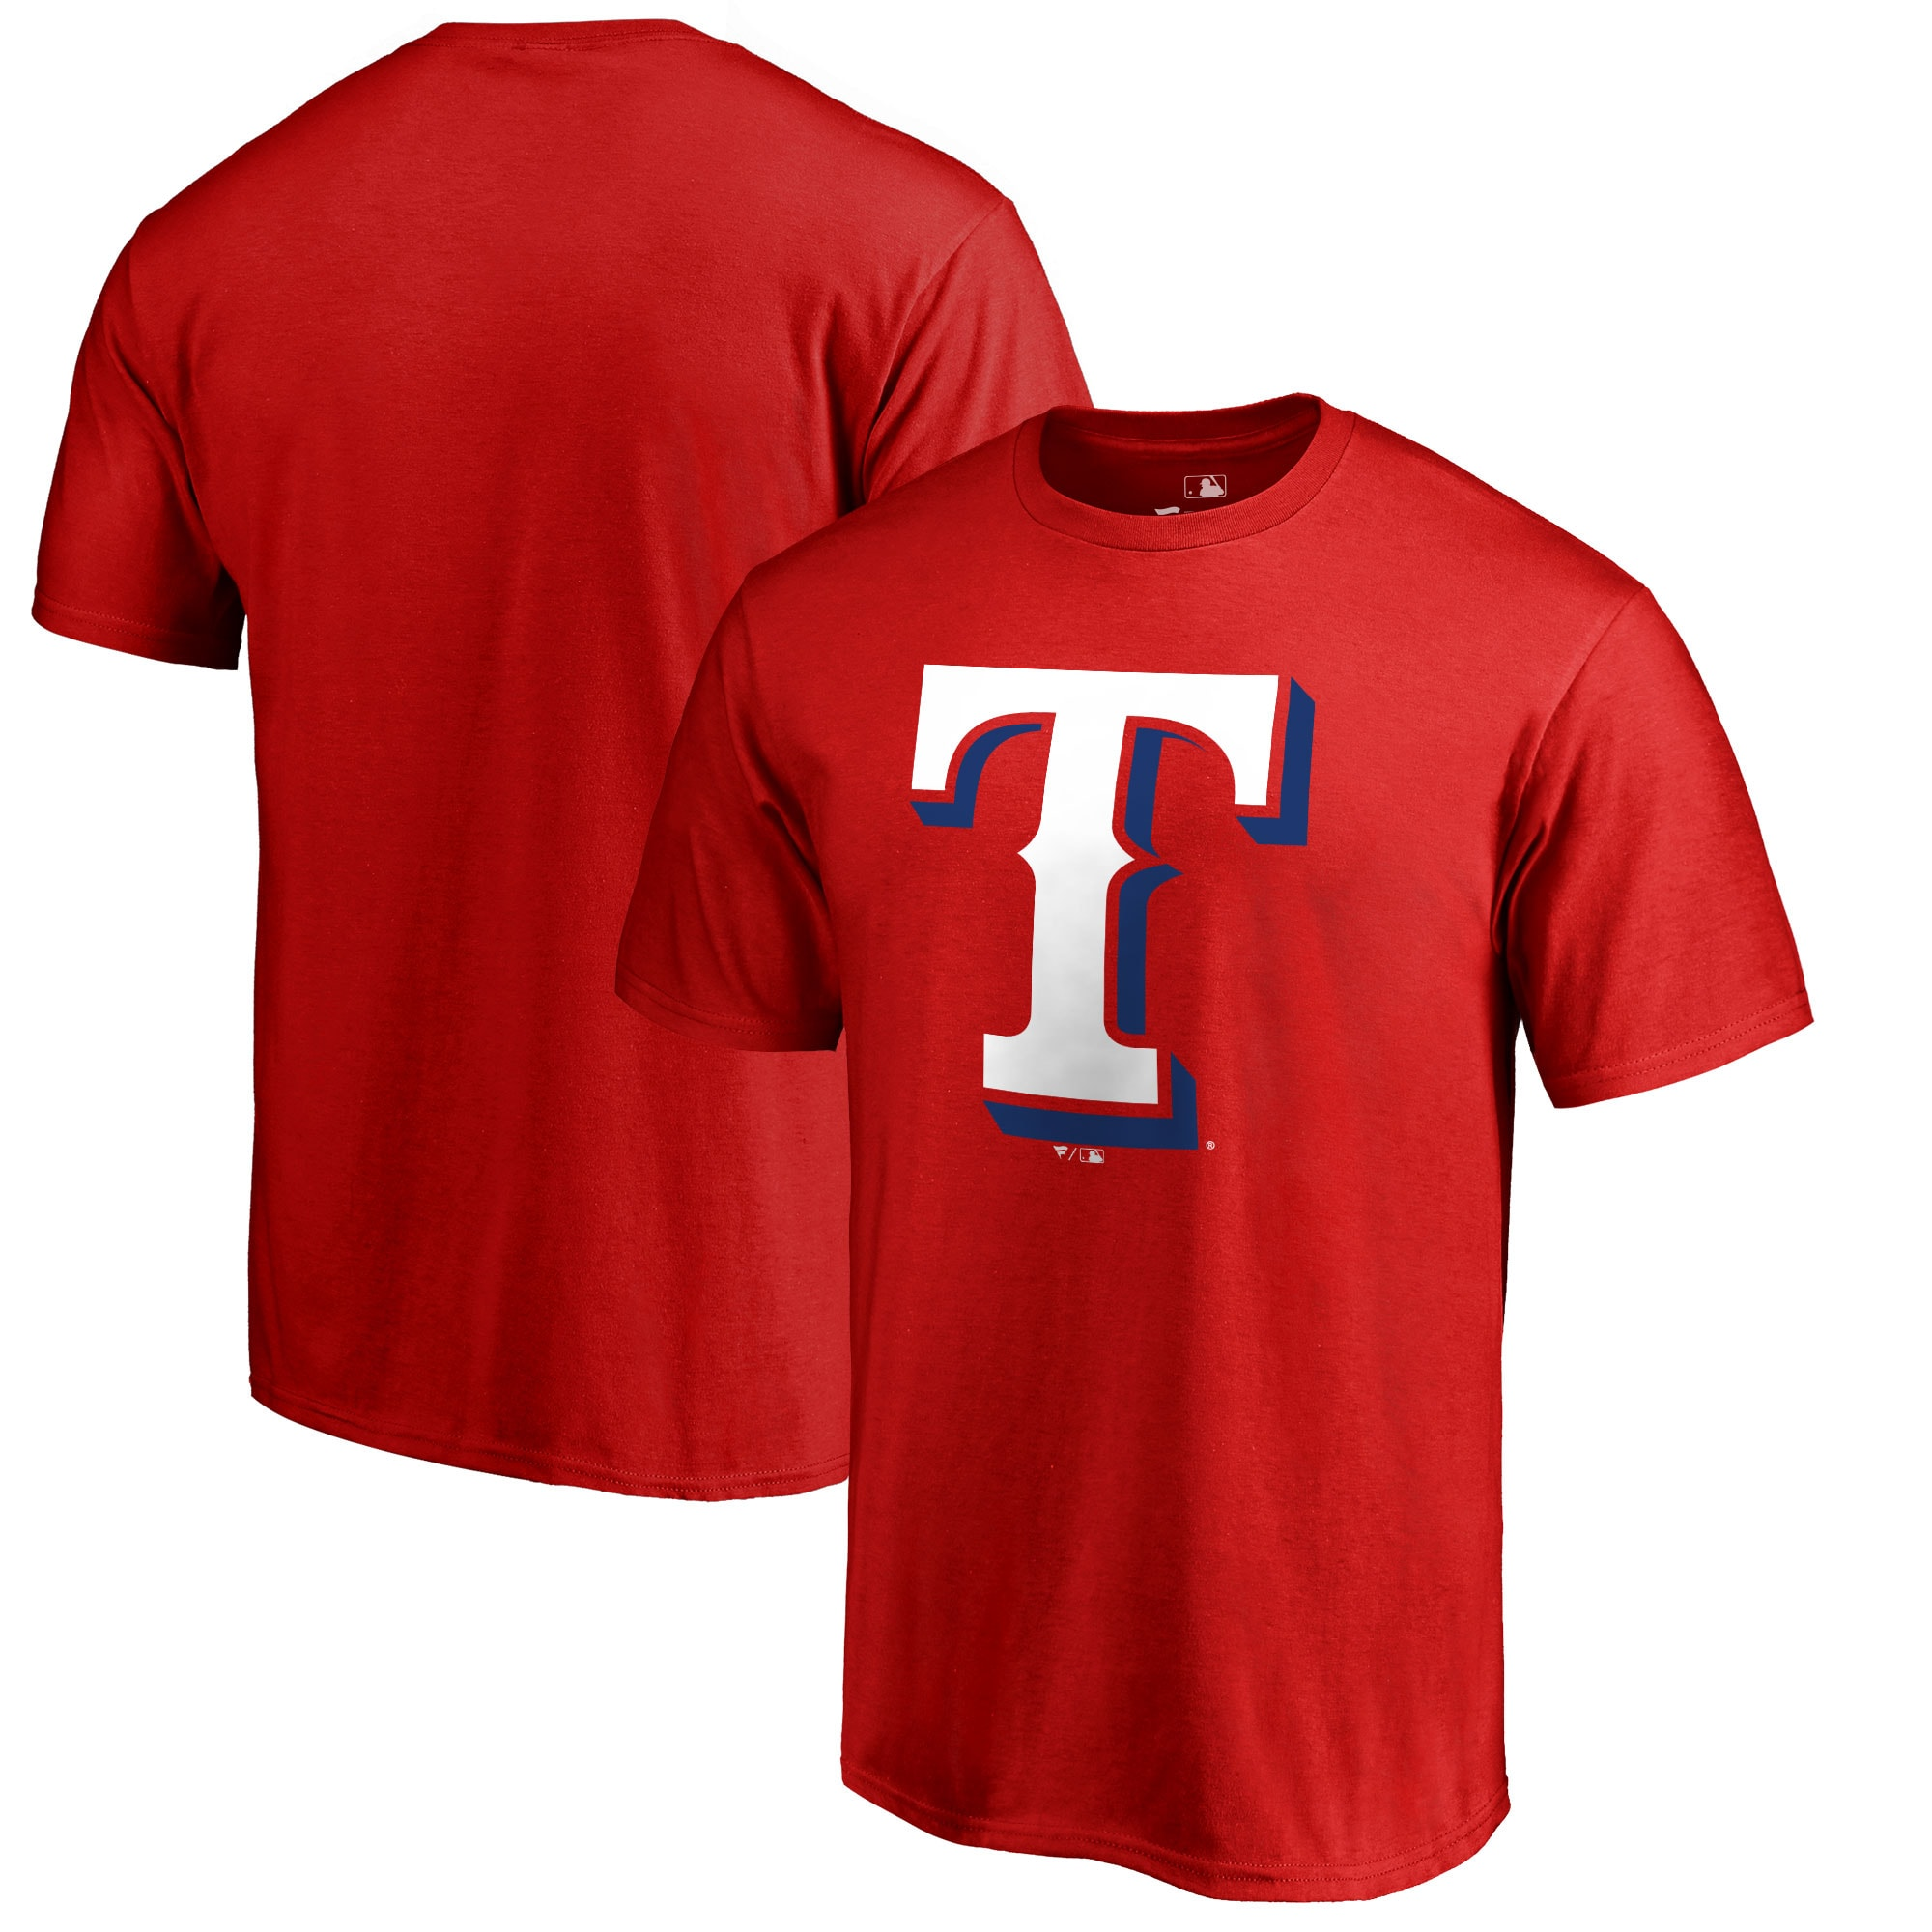 Texas Rangers Big & Tall Primary Team Logo T-Shirt - Red